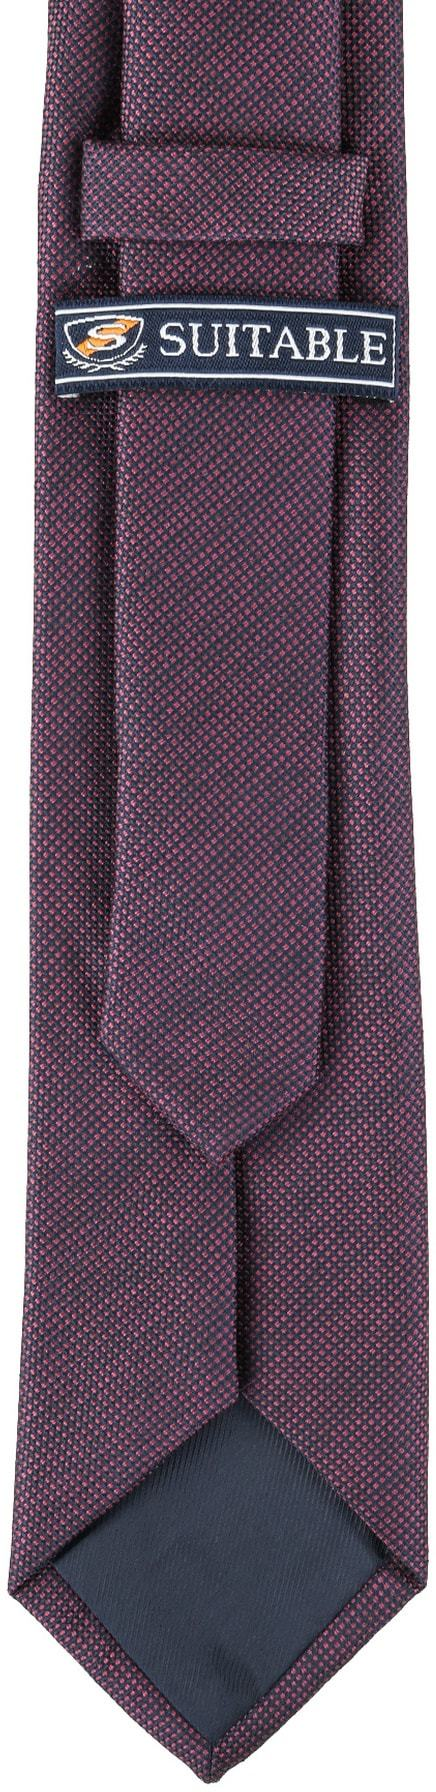 Krawatte Seide Pinpoint Bordeaux 9-17 foto 3